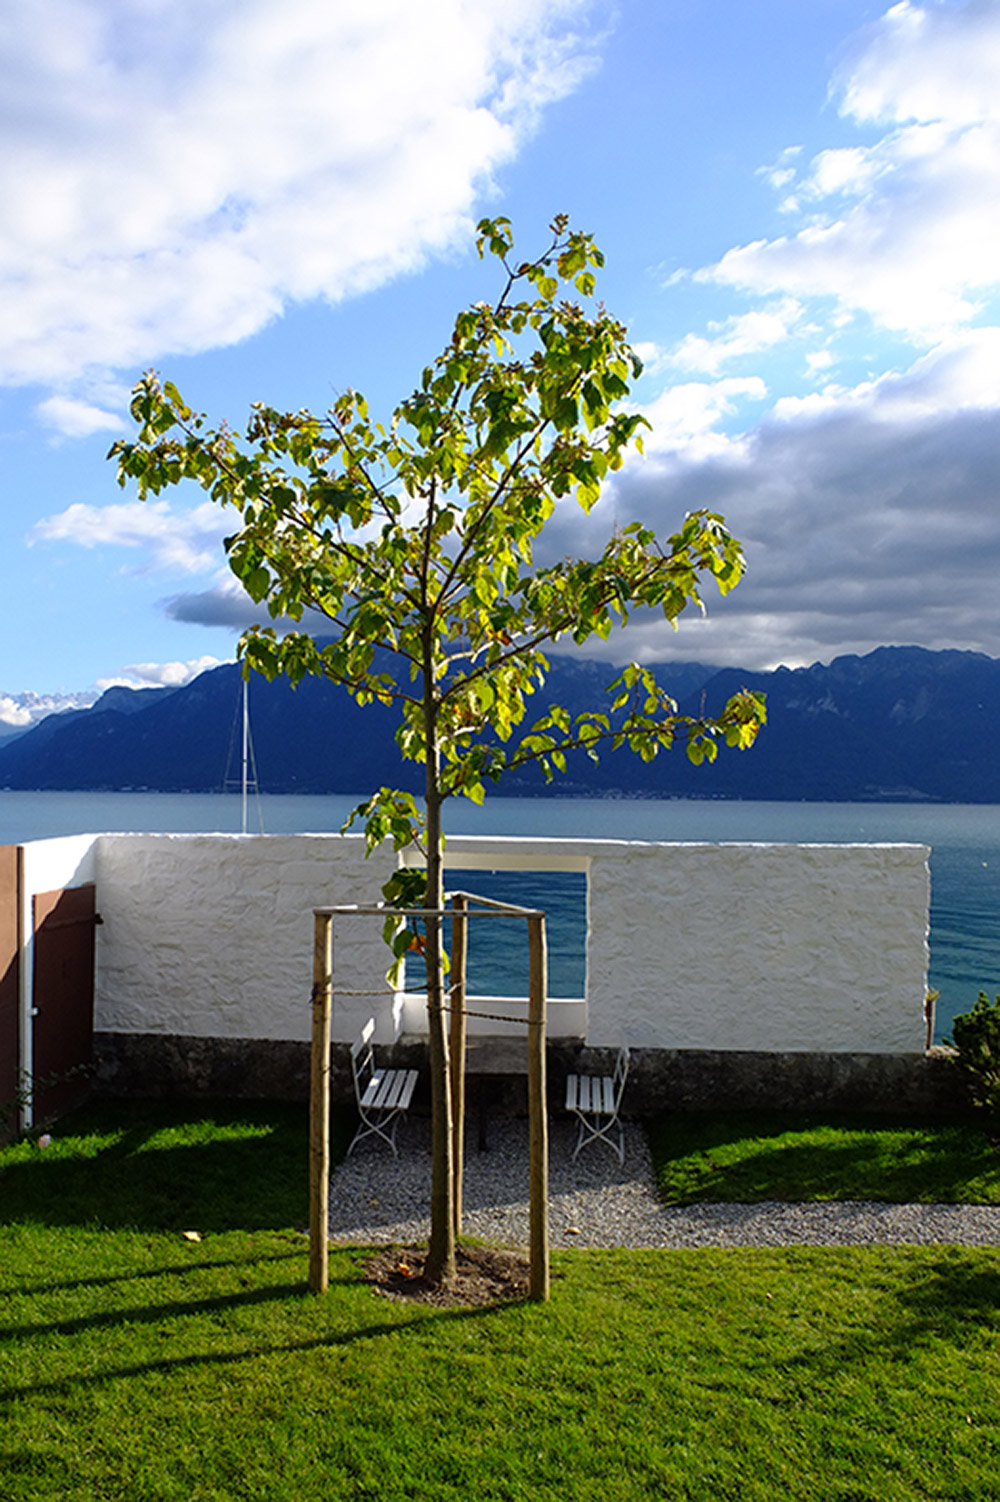 Villa Le-Lac 20.9.15. עץ הפואולוניה החדש שנשתל במקומו של העץ שנעקר יוחלף בנצר של העץ המקורי, לכשיגדל